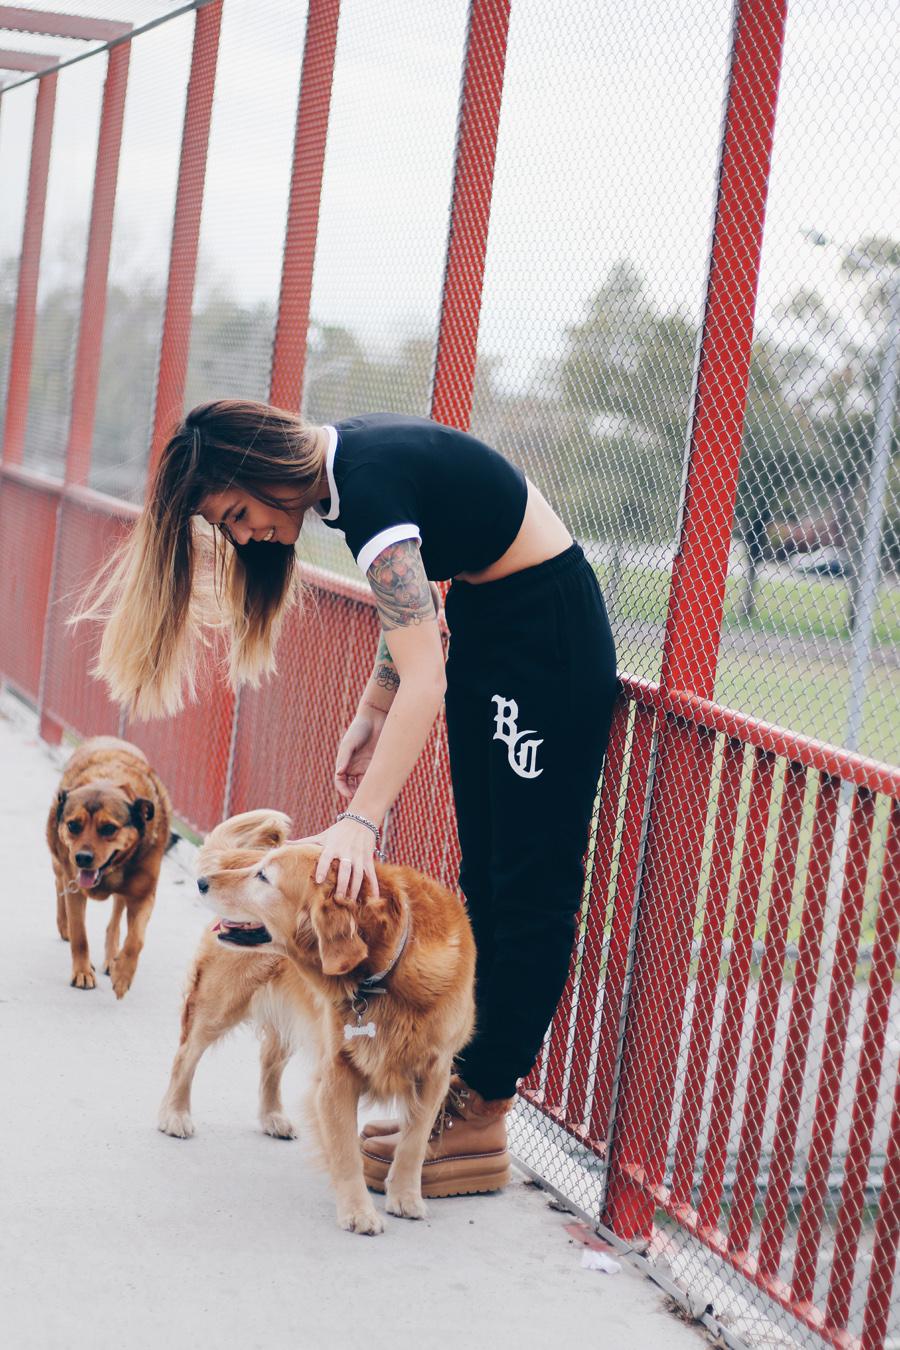 Cassandra Valdes | Nueva tendencia en moda